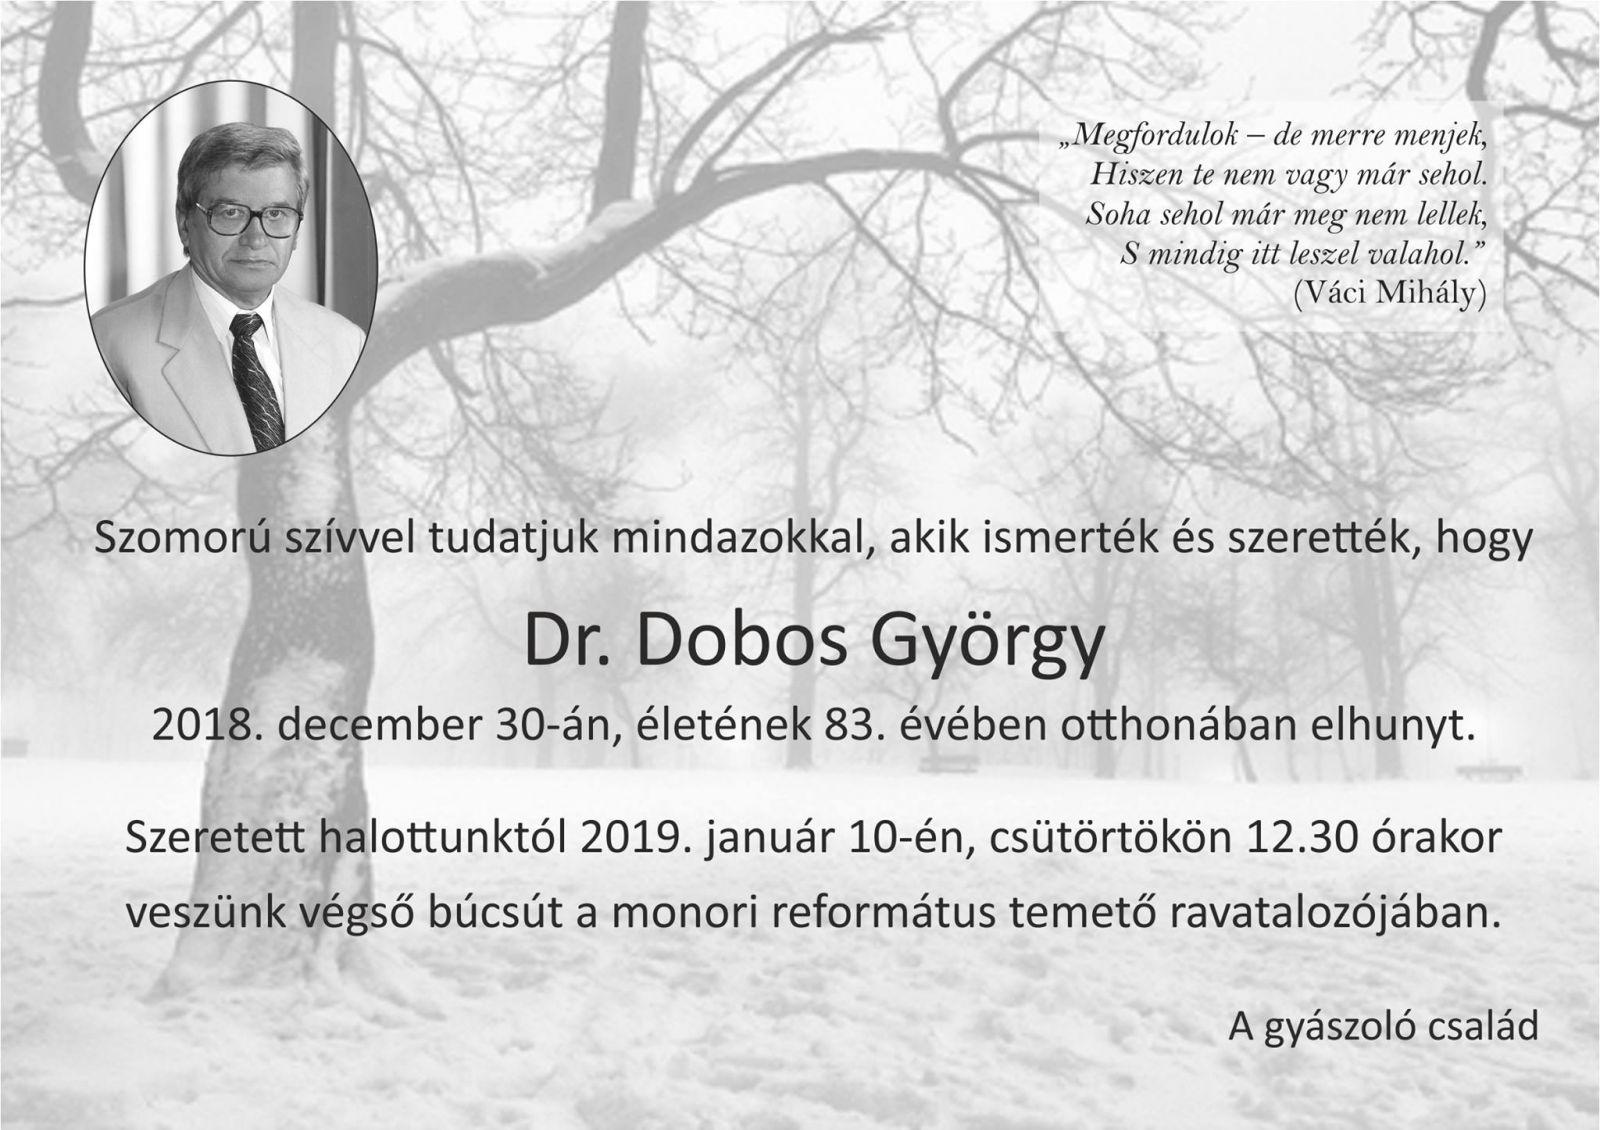 Elhunyt Dr. Dobos György